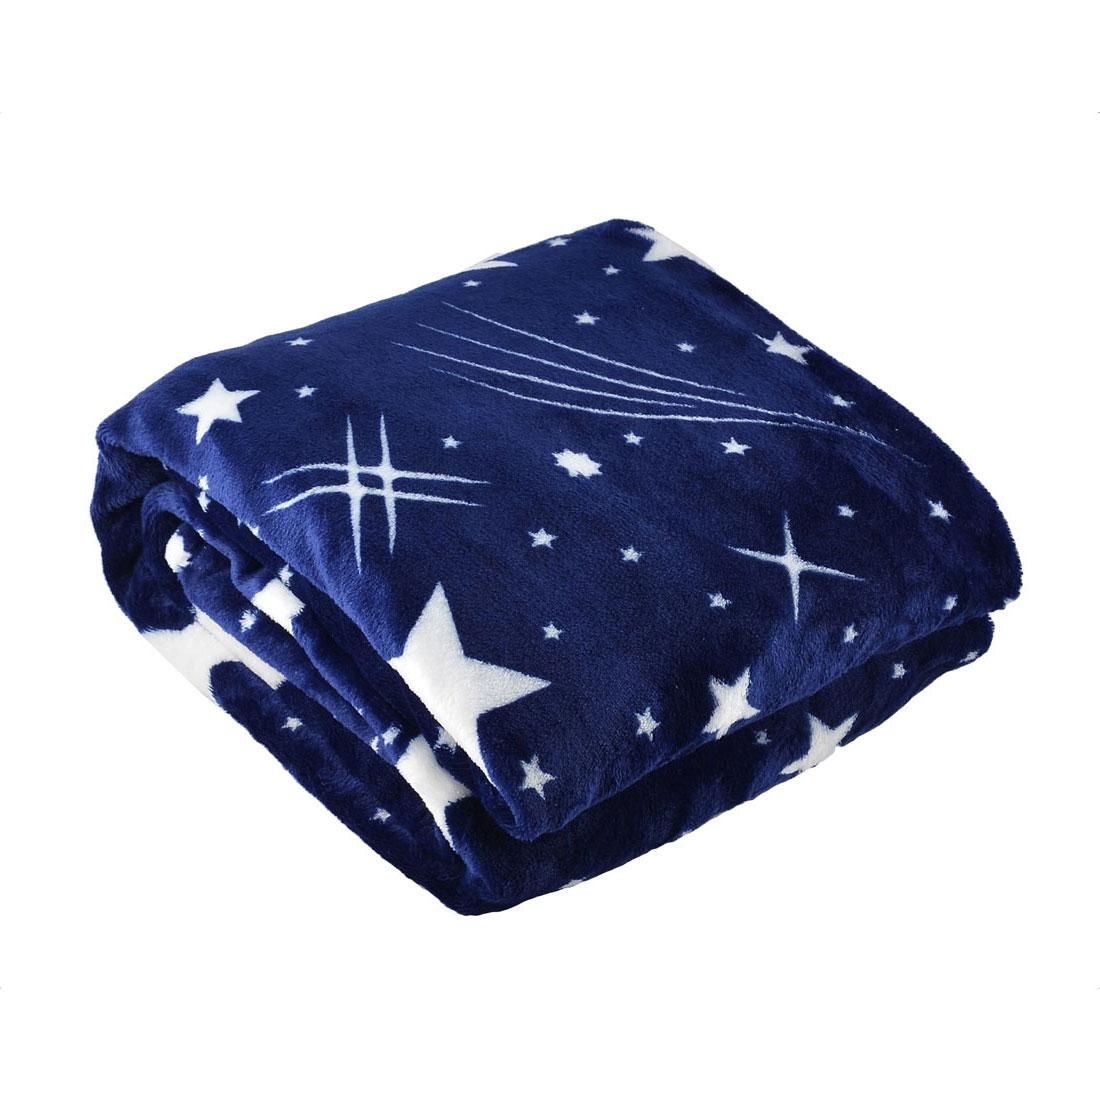 150 x 200cm Twin Size Home Bedroom Warm Throw Blanket Rug Plush Fleece Bed Quilt Sofa Soft Star Pattern Dark Blue